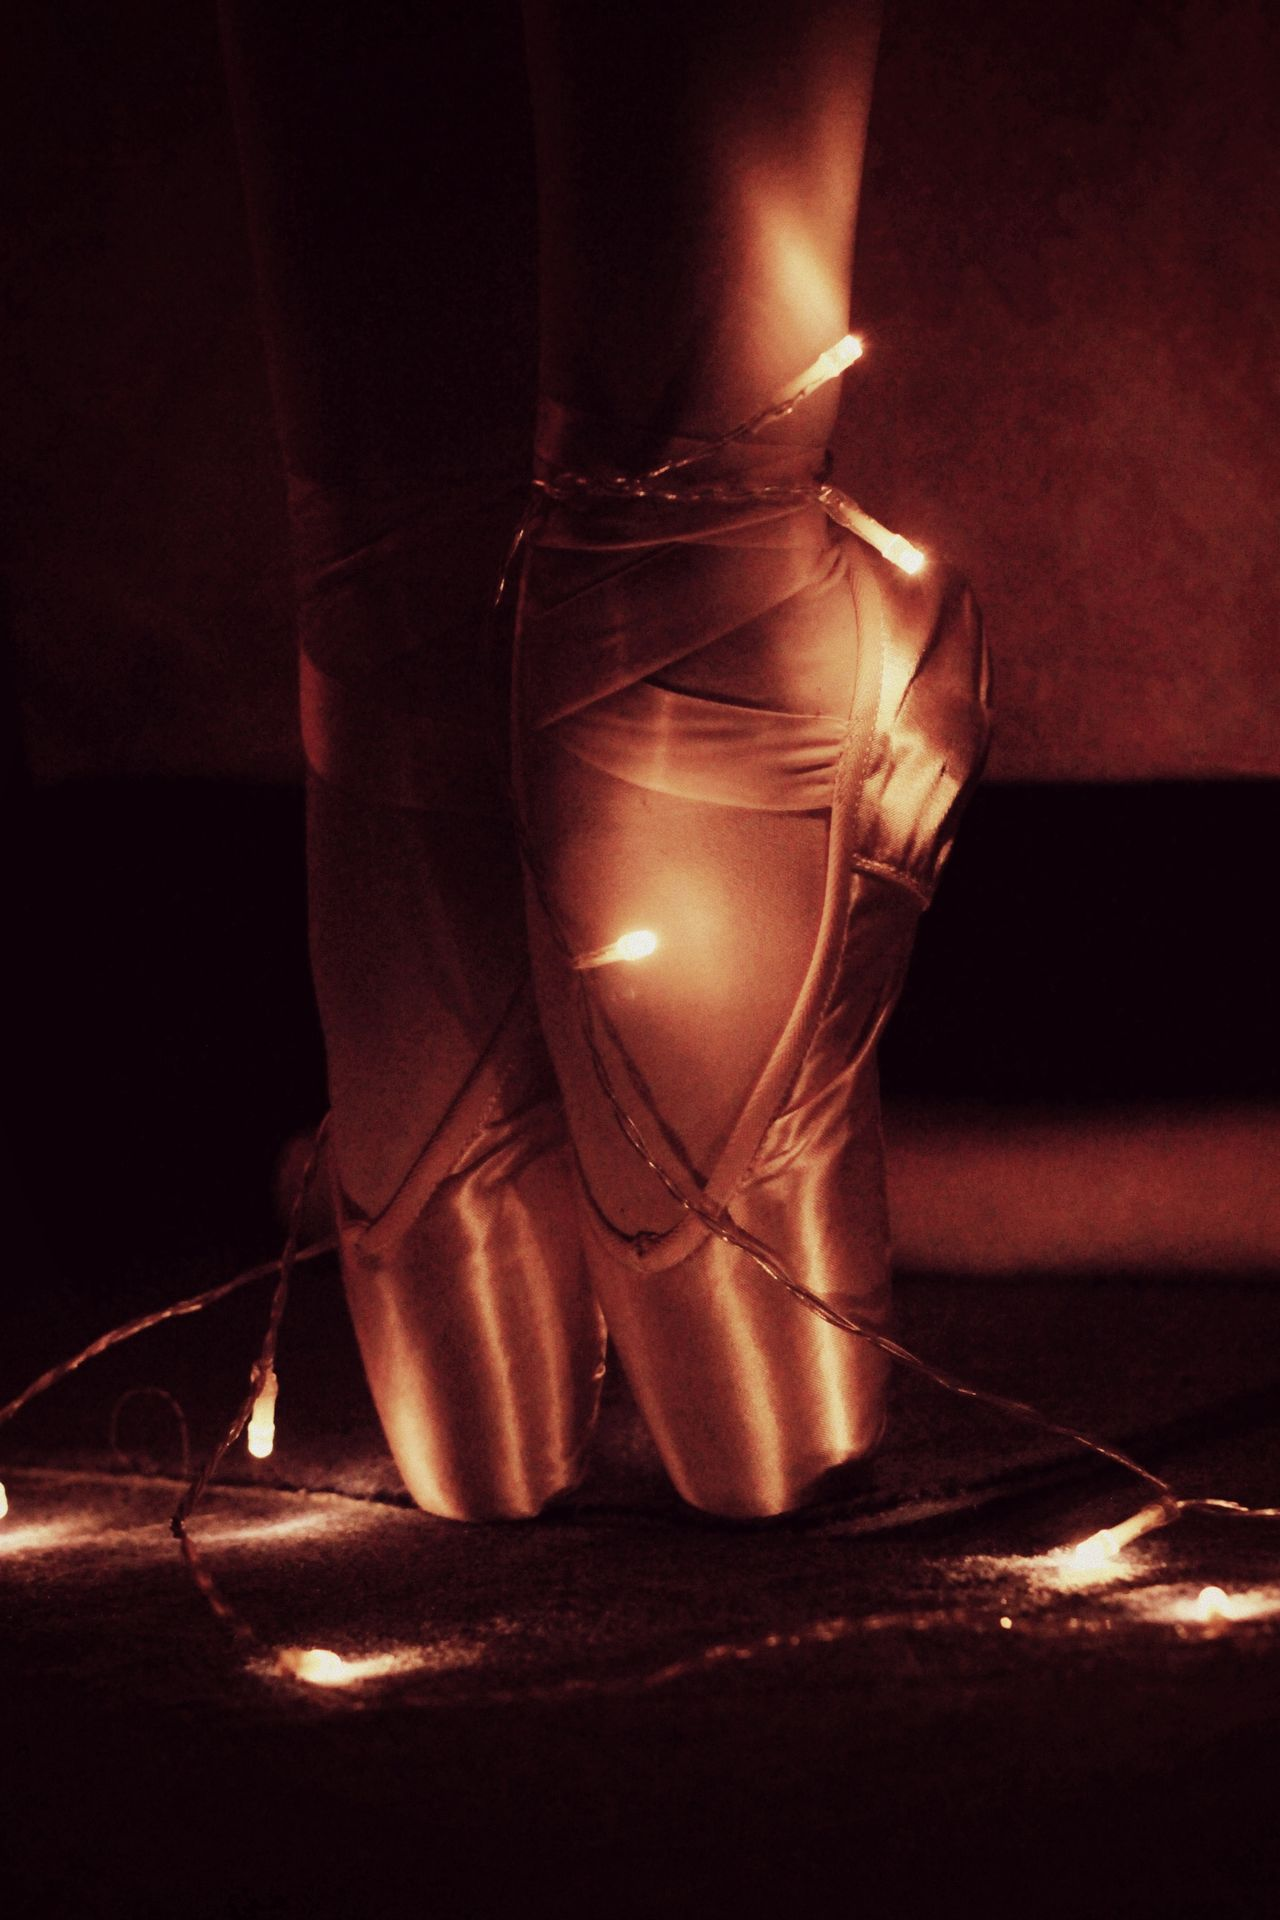 Ballett Ballerina Christmas Lights Love PointeShoes  Christmas Around The World Germany